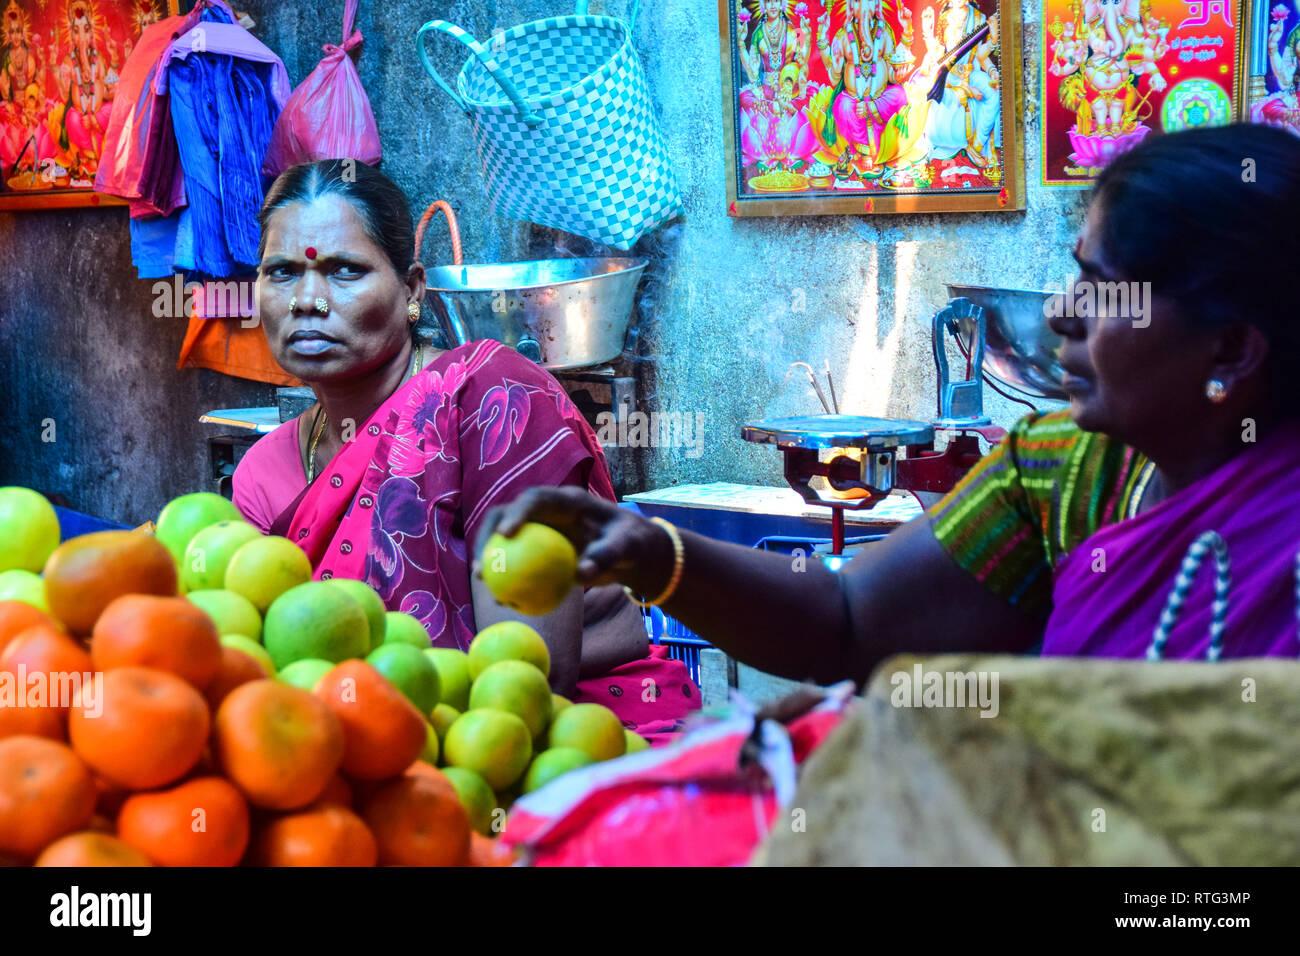 Fearsome Indian Lady, Goubert Market, Pondicherry, Puducherry, Tamil Nadu, India - Stock Image